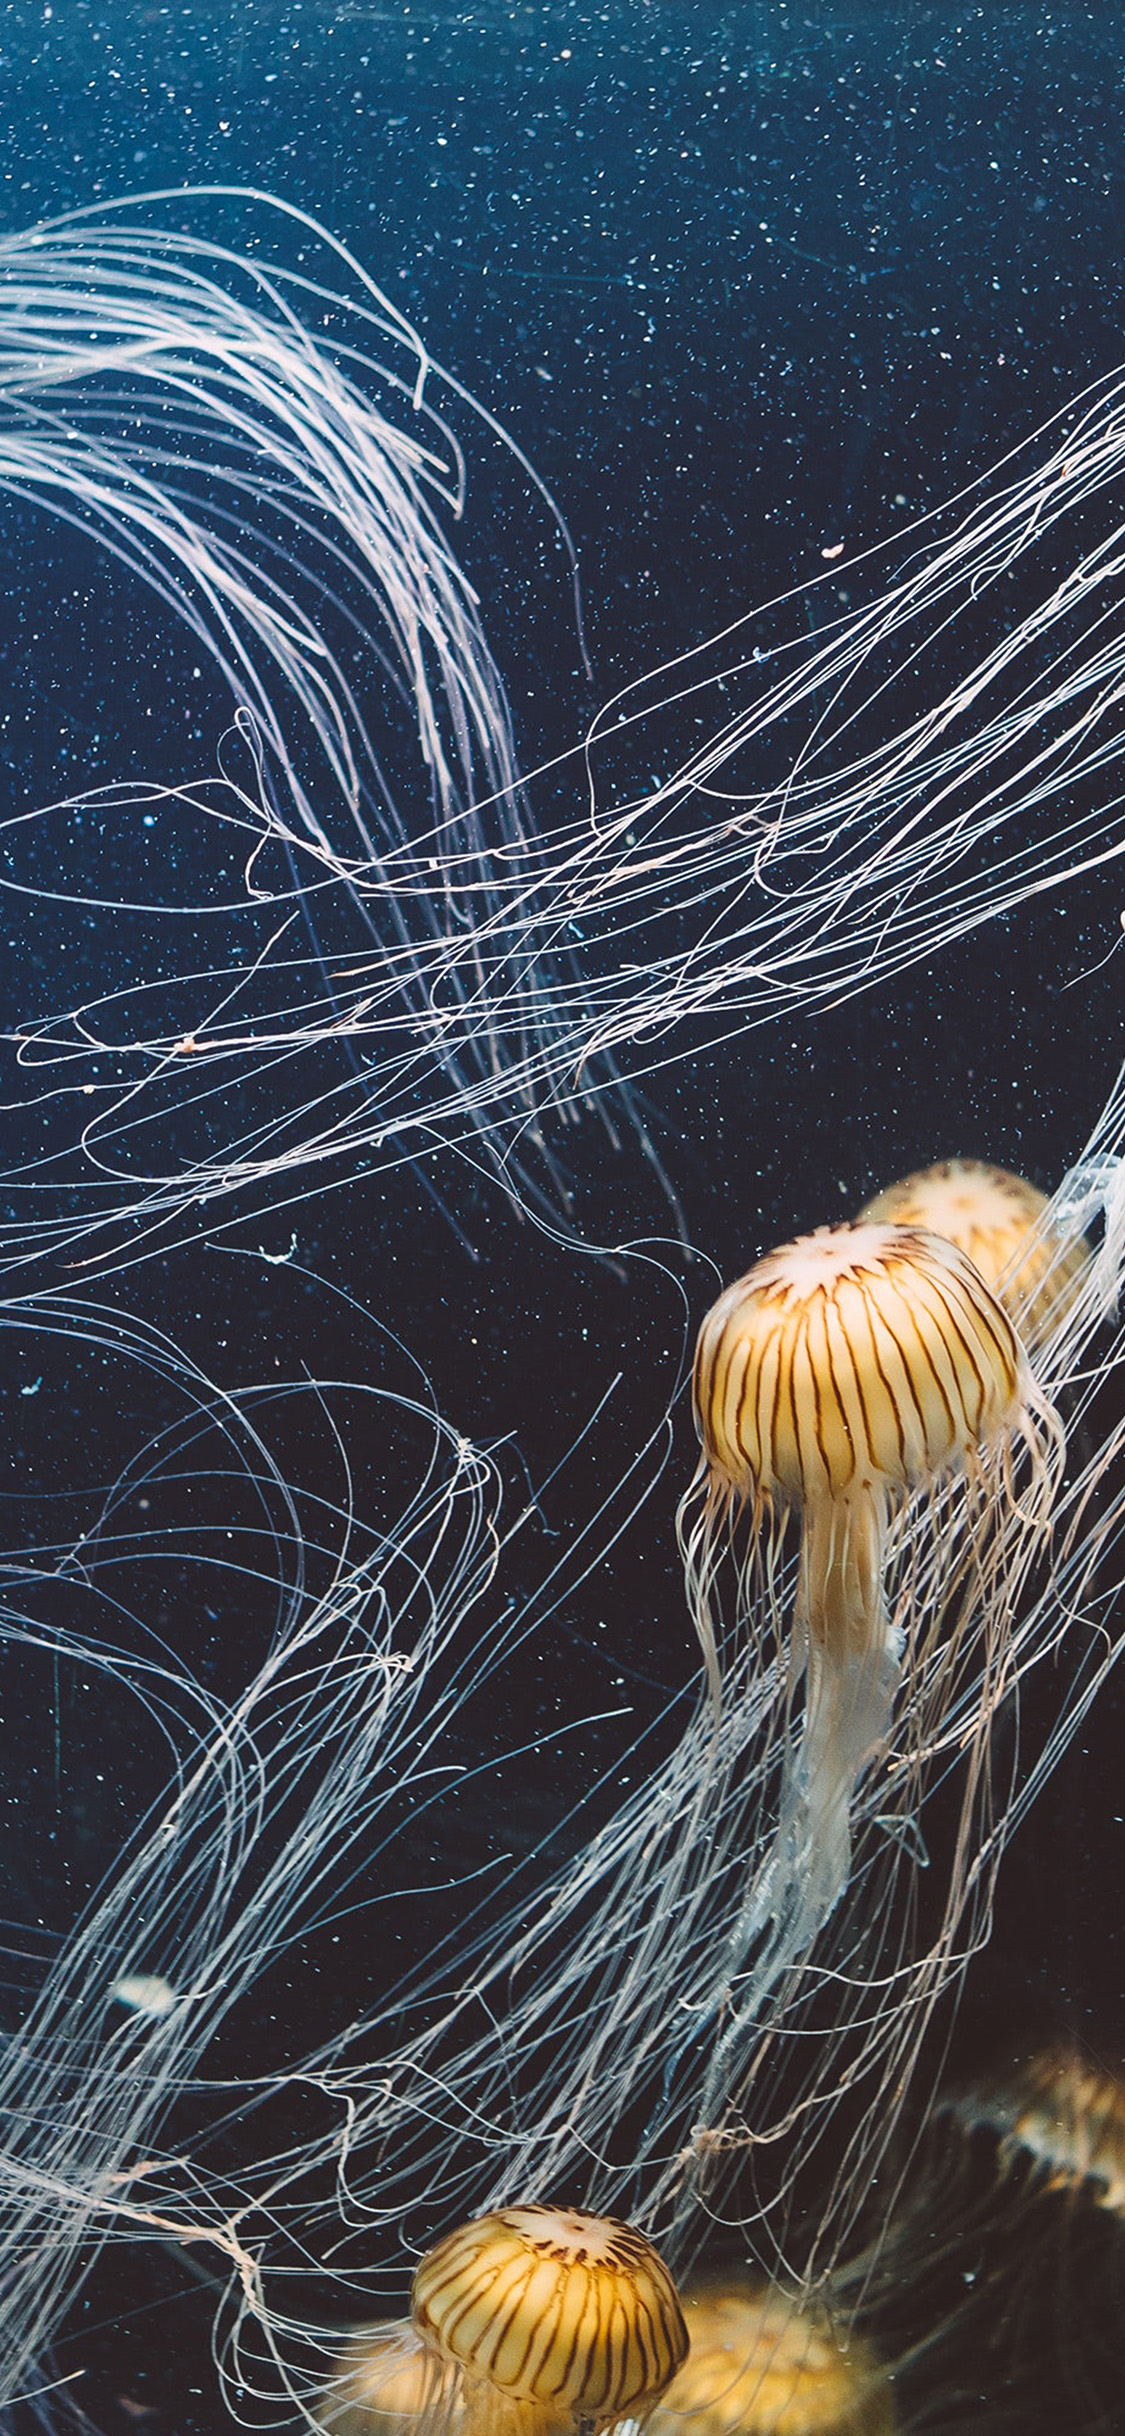 iPhonexpapers.com-Apple-iPhone-wallpaper-oc01-animal-water-sea-ghost-jellyfish-ocean-nature